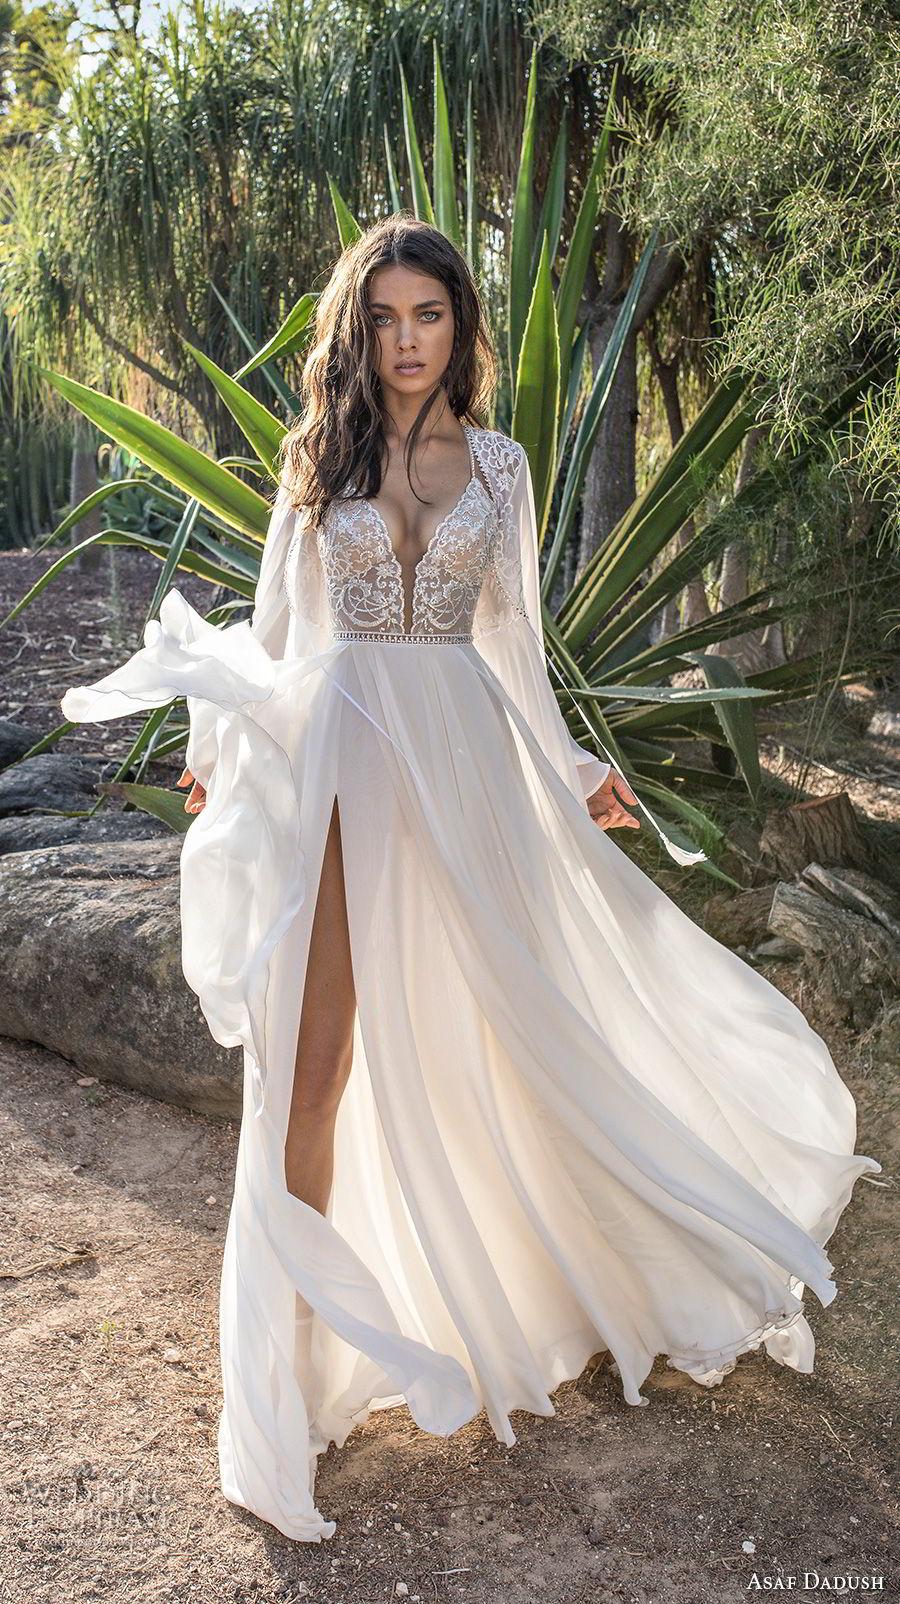 asaf dadush 2018 bridal long sleeves deep plunging sweetheart neckline heavily embellished bodice high slit skirt soft a  line wedding dress covered lace back sweep train (4) mv